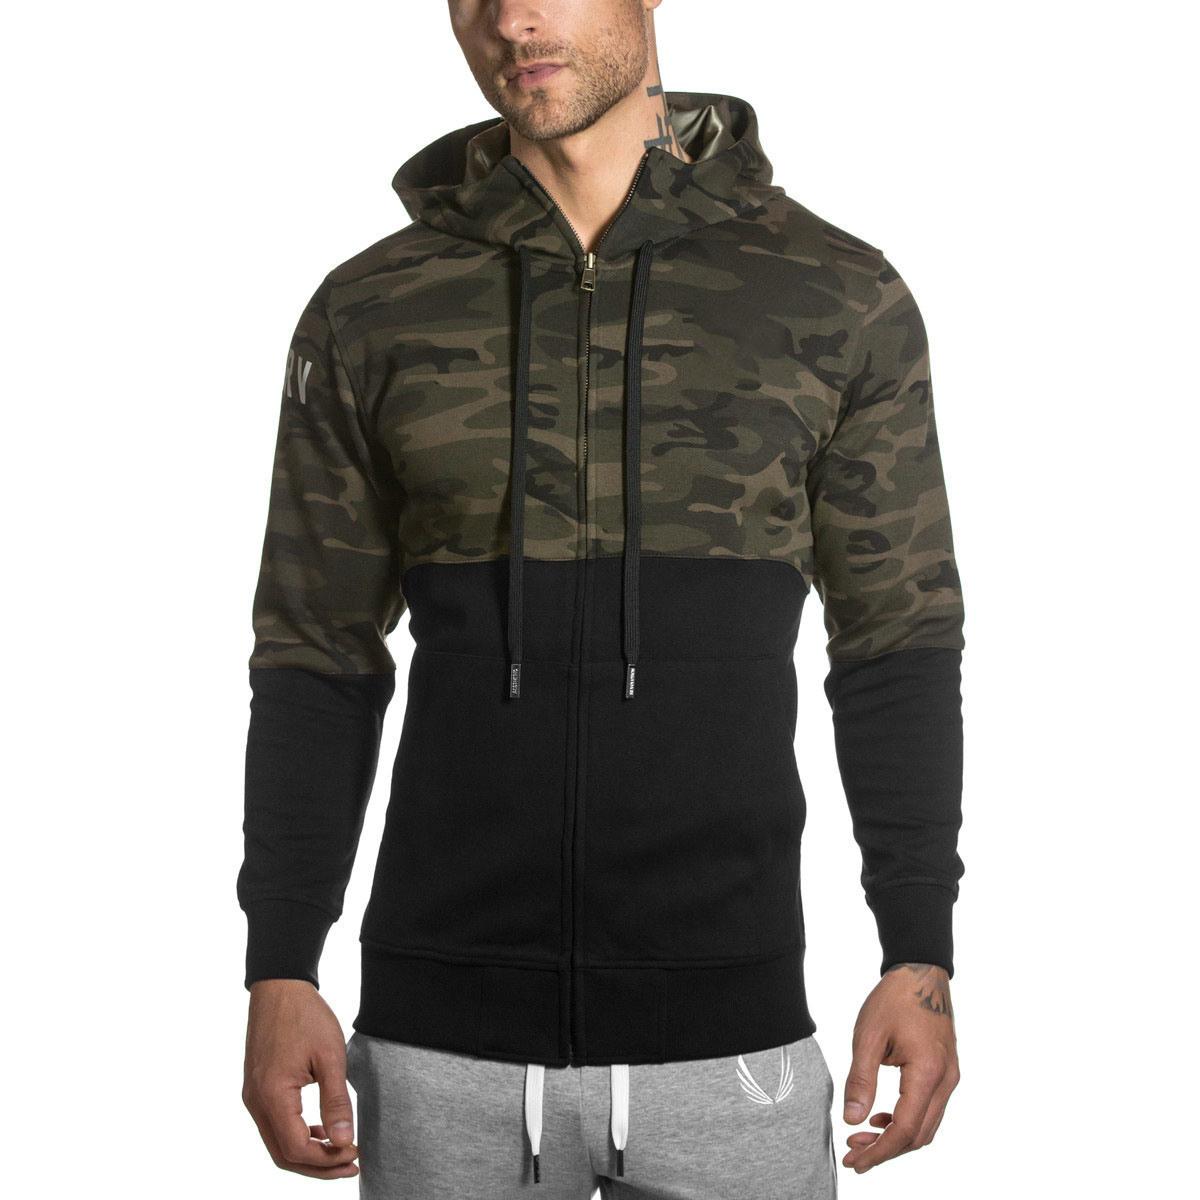 Fashion Mosaic 100% Cotton Hoodies for Men Sports Wear